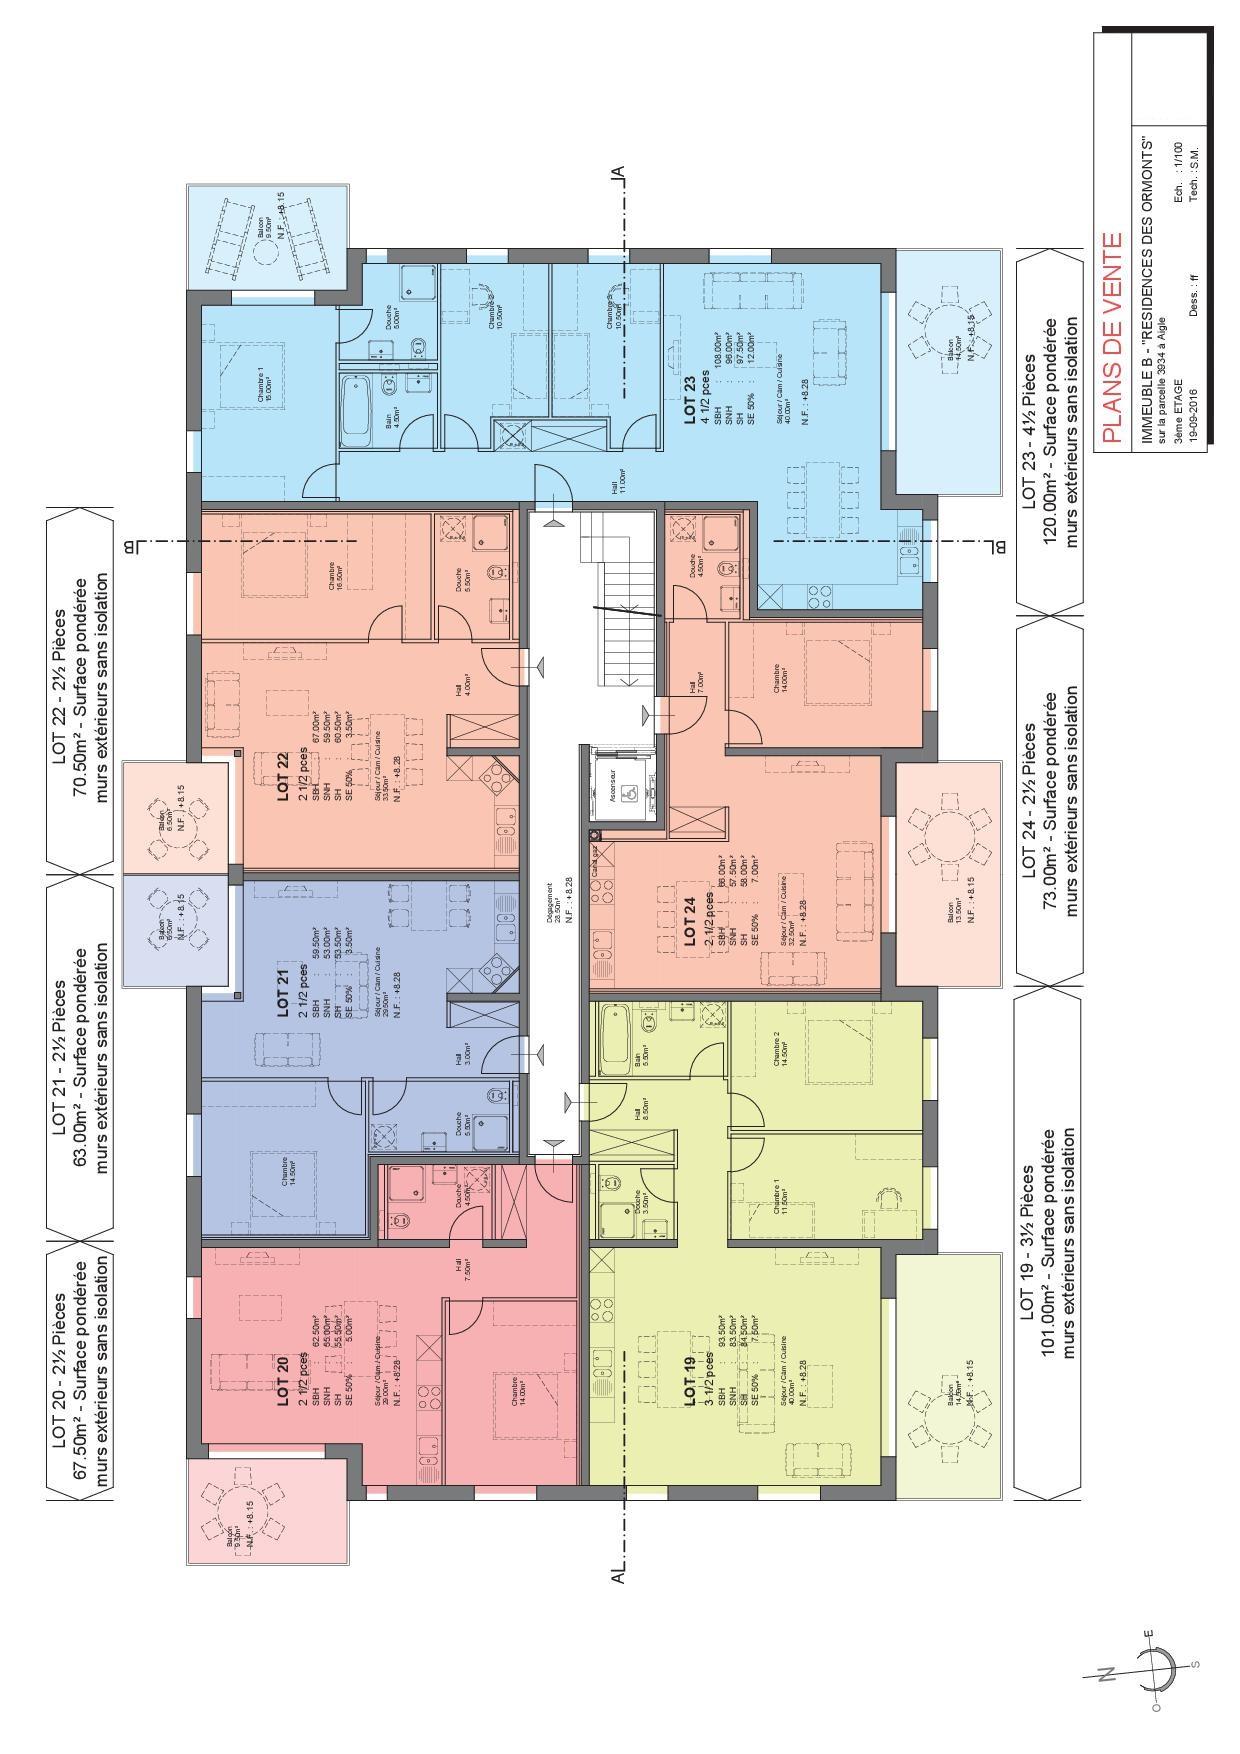 Plan 3e étage (lot 19 à 24)